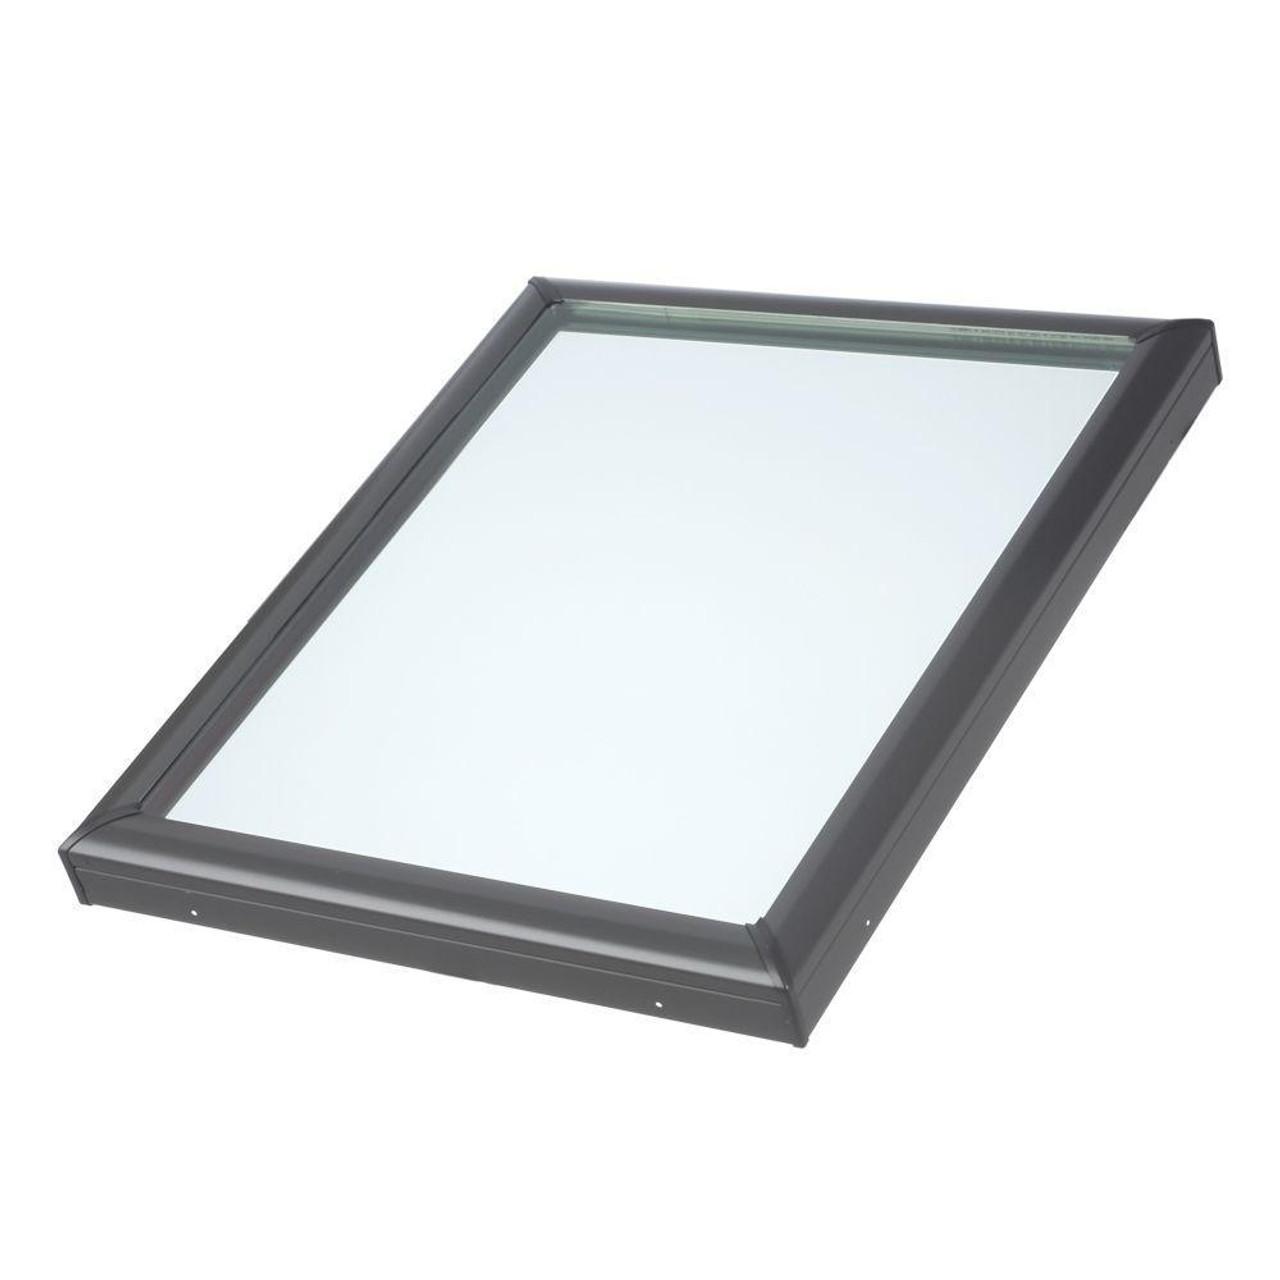 Velux 46 1 2 In X 46 1 2 In Fixed Skylight Fcm 4646